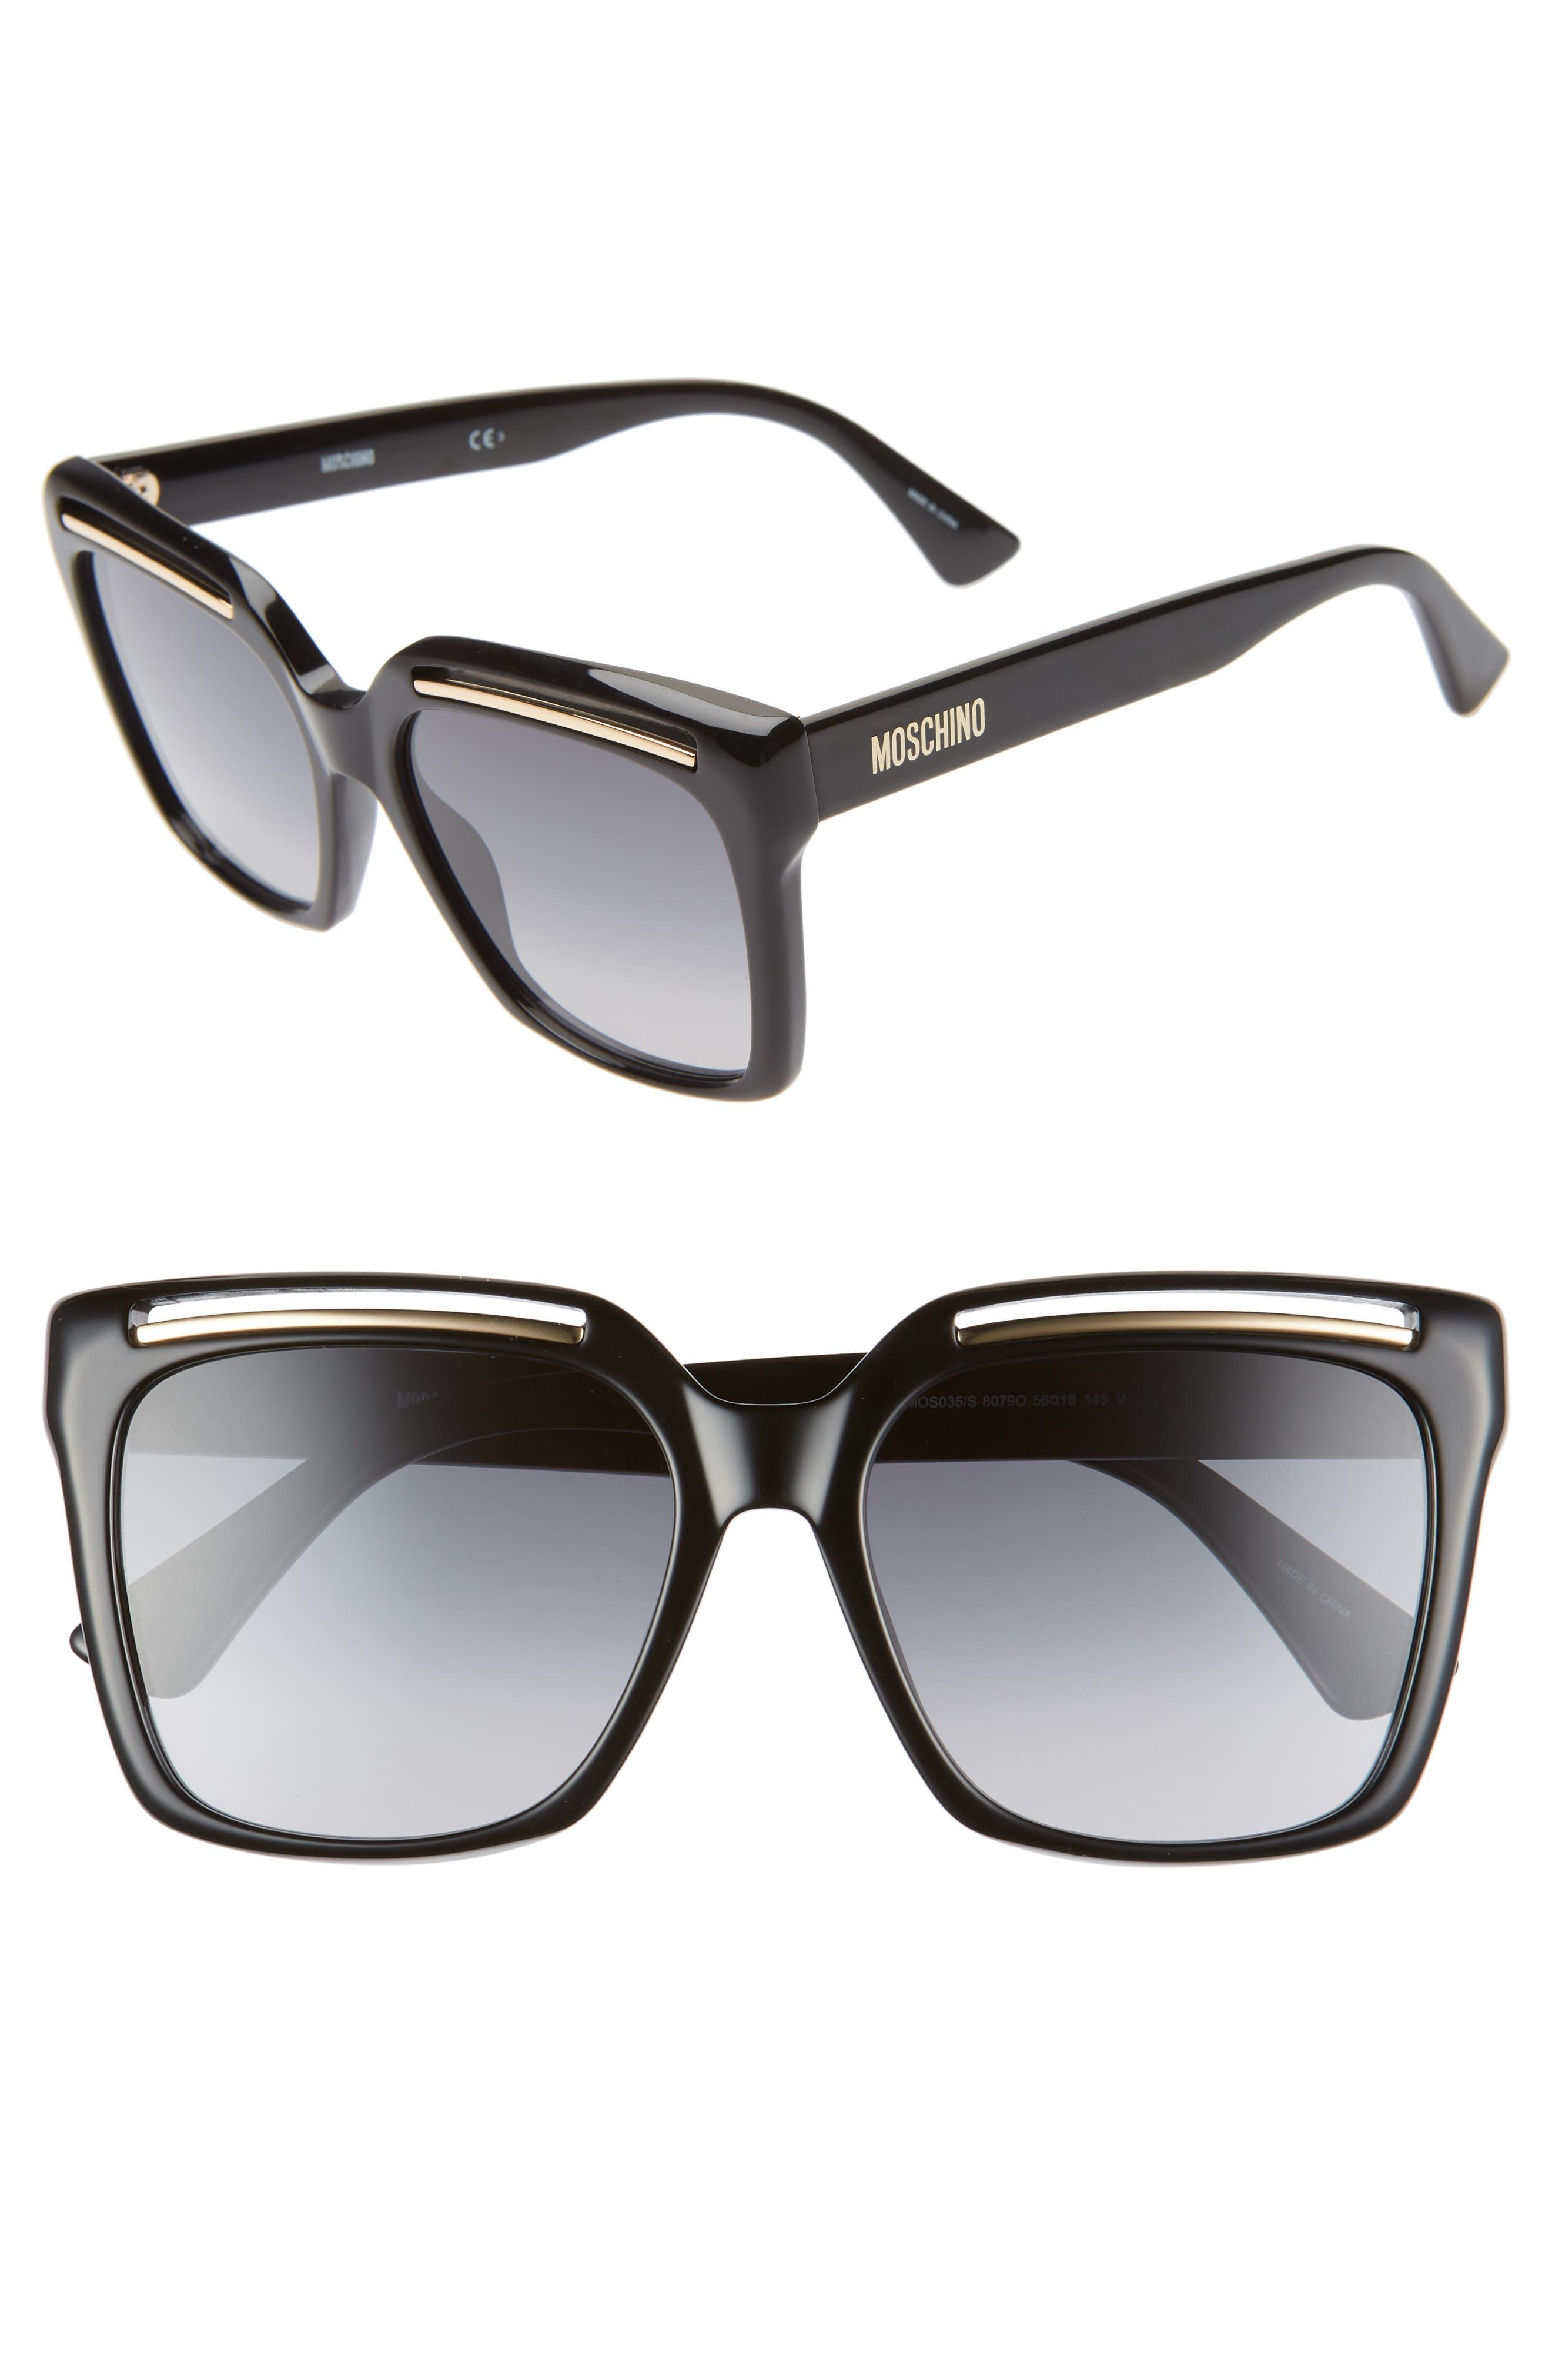 MOSCHINO, 56mm Gradient Square Sunglasses, Main thumbnail 1, color, BLACK